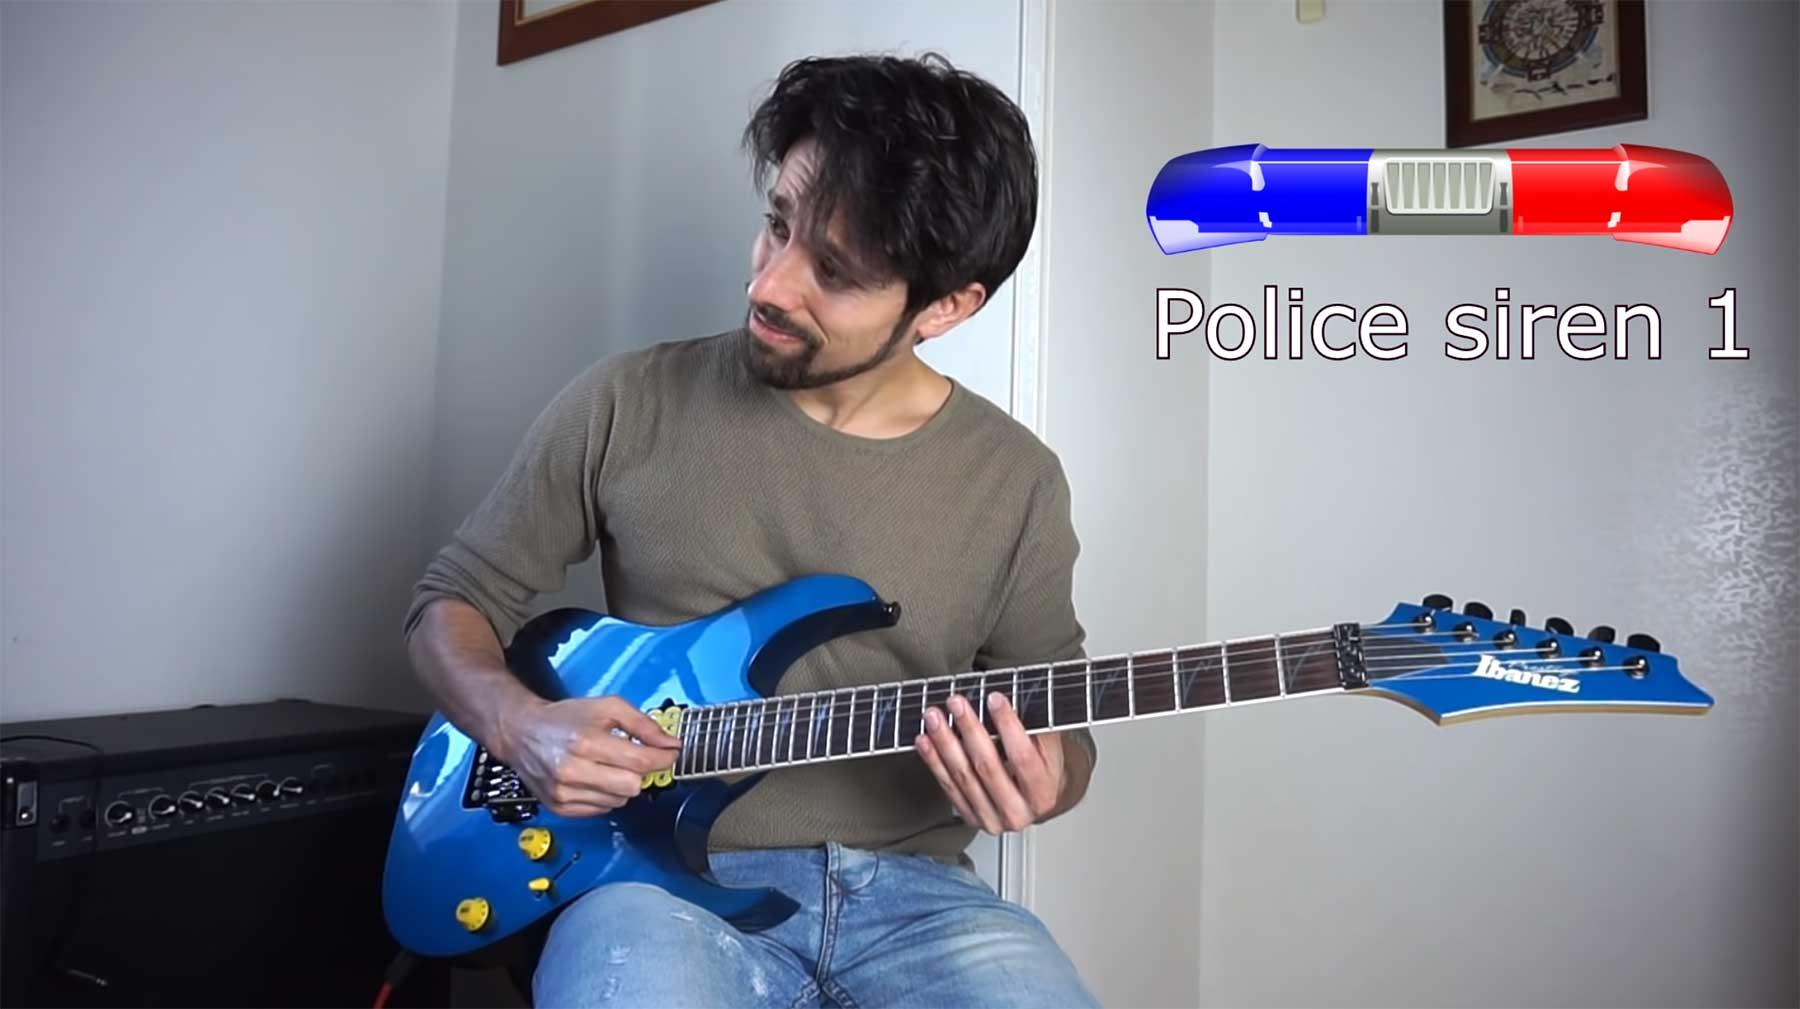 Stadtgeräusche auf der E-Gitarre nachgemacht